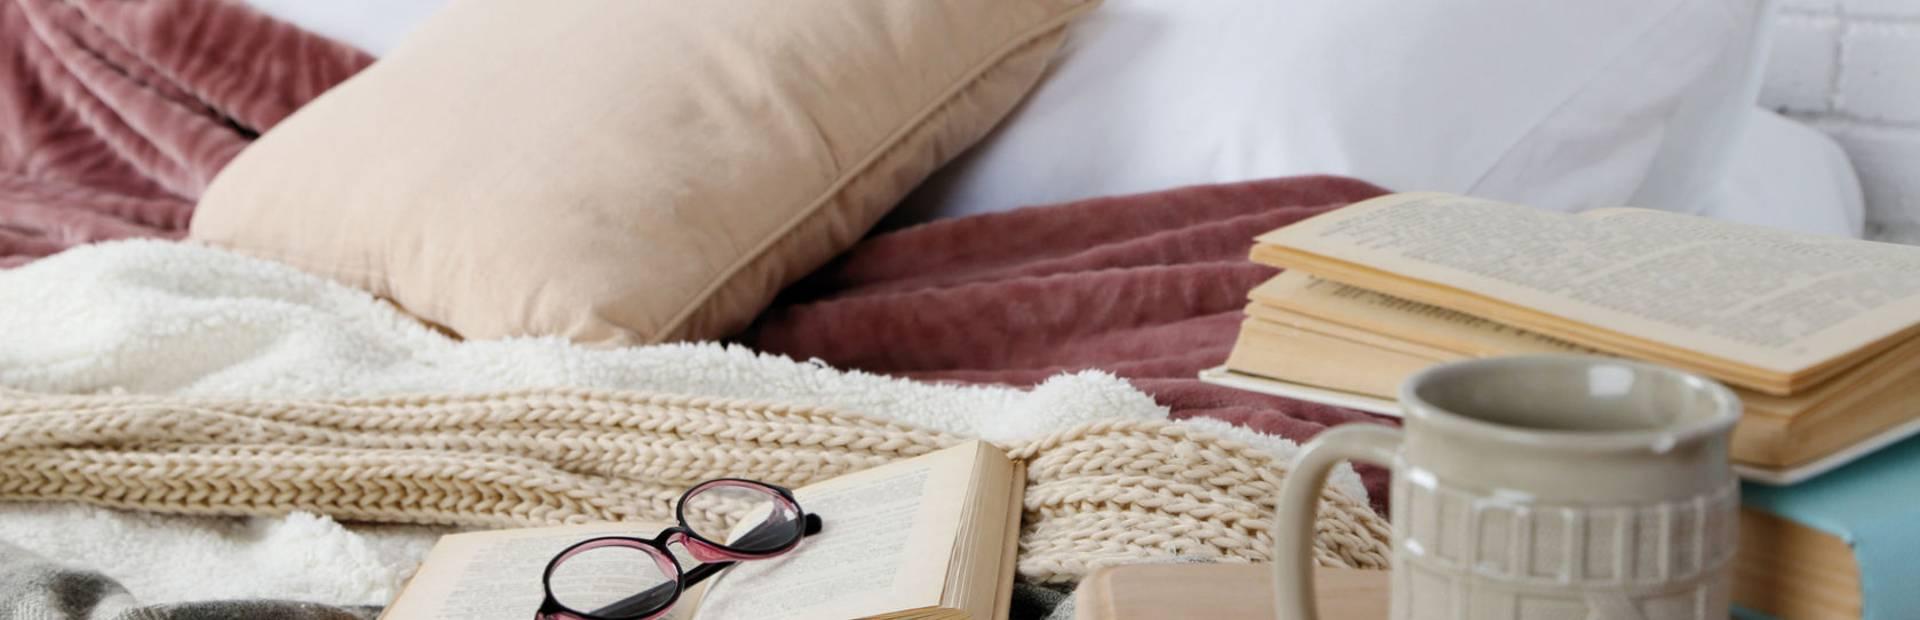 hebergement en Pays Bigouden Sud - Taxe de séjour